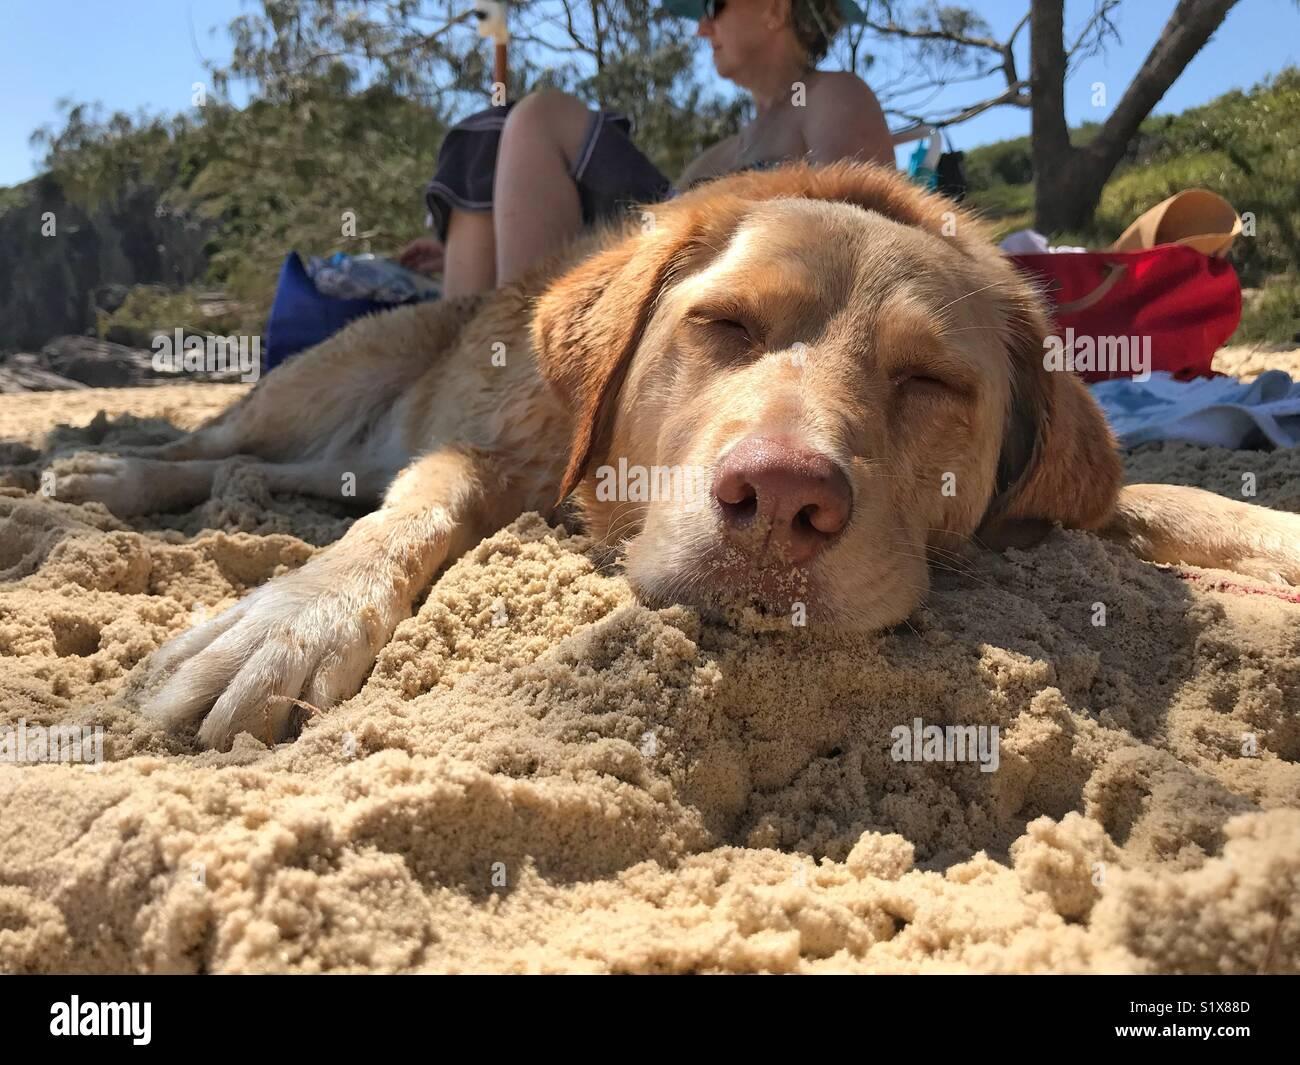 A golden Labrador cross bread dog sleeps very peacefully on the warm sun of a golden Australian Beach. - Stock Image